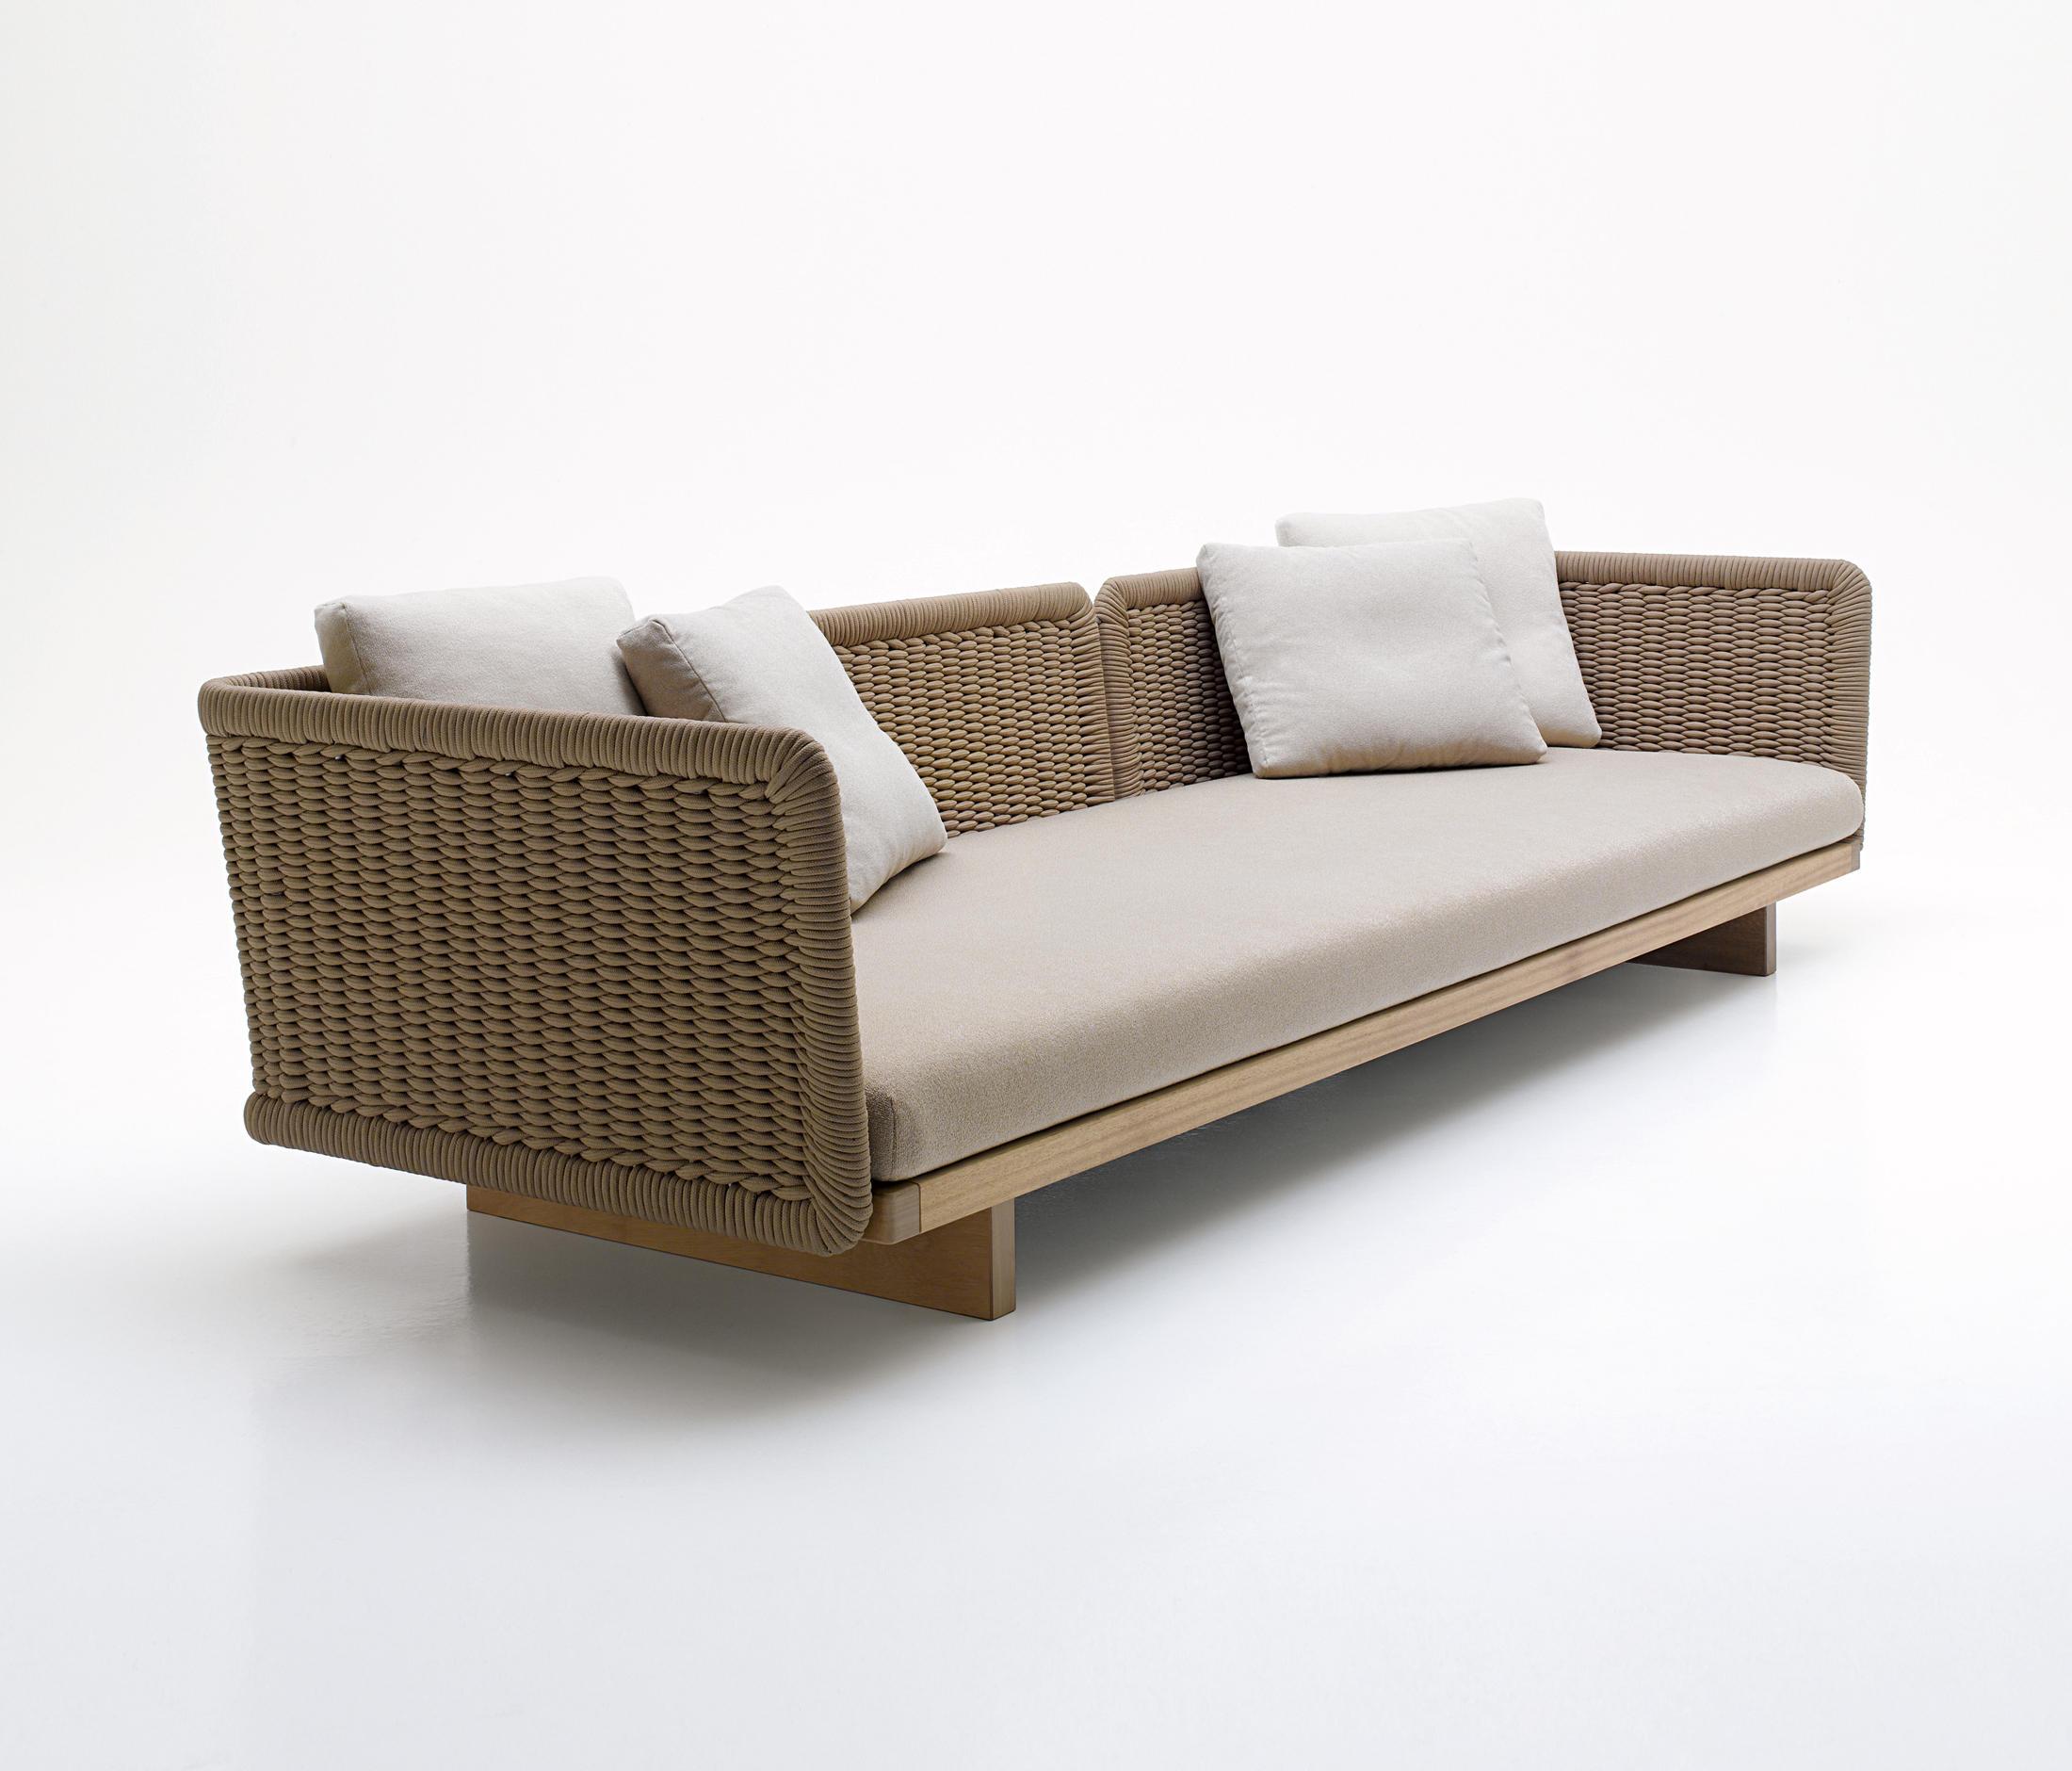 Sabi sofas from paola lenti architonic for Paola lenti